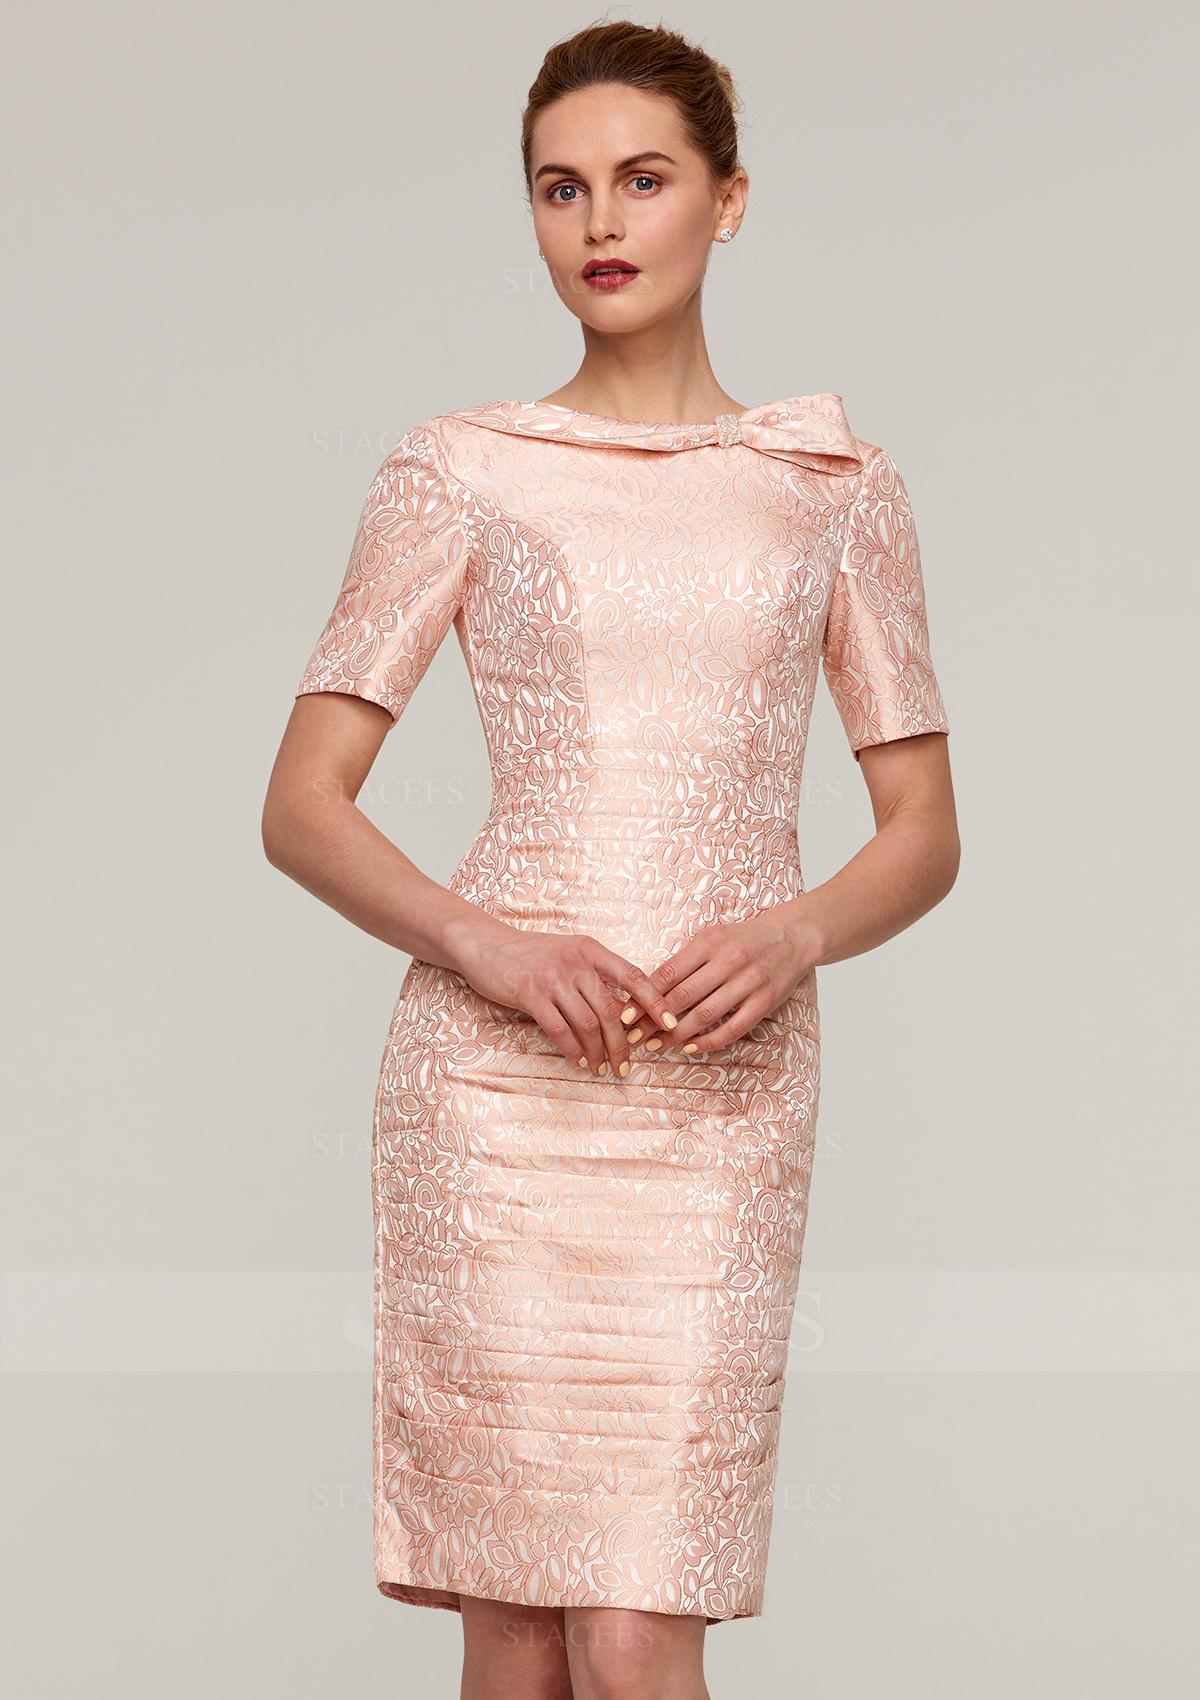 0d371d214143 Home · Wedding Party Dresses · Mother of the Bride Dresses  S18071M. Color